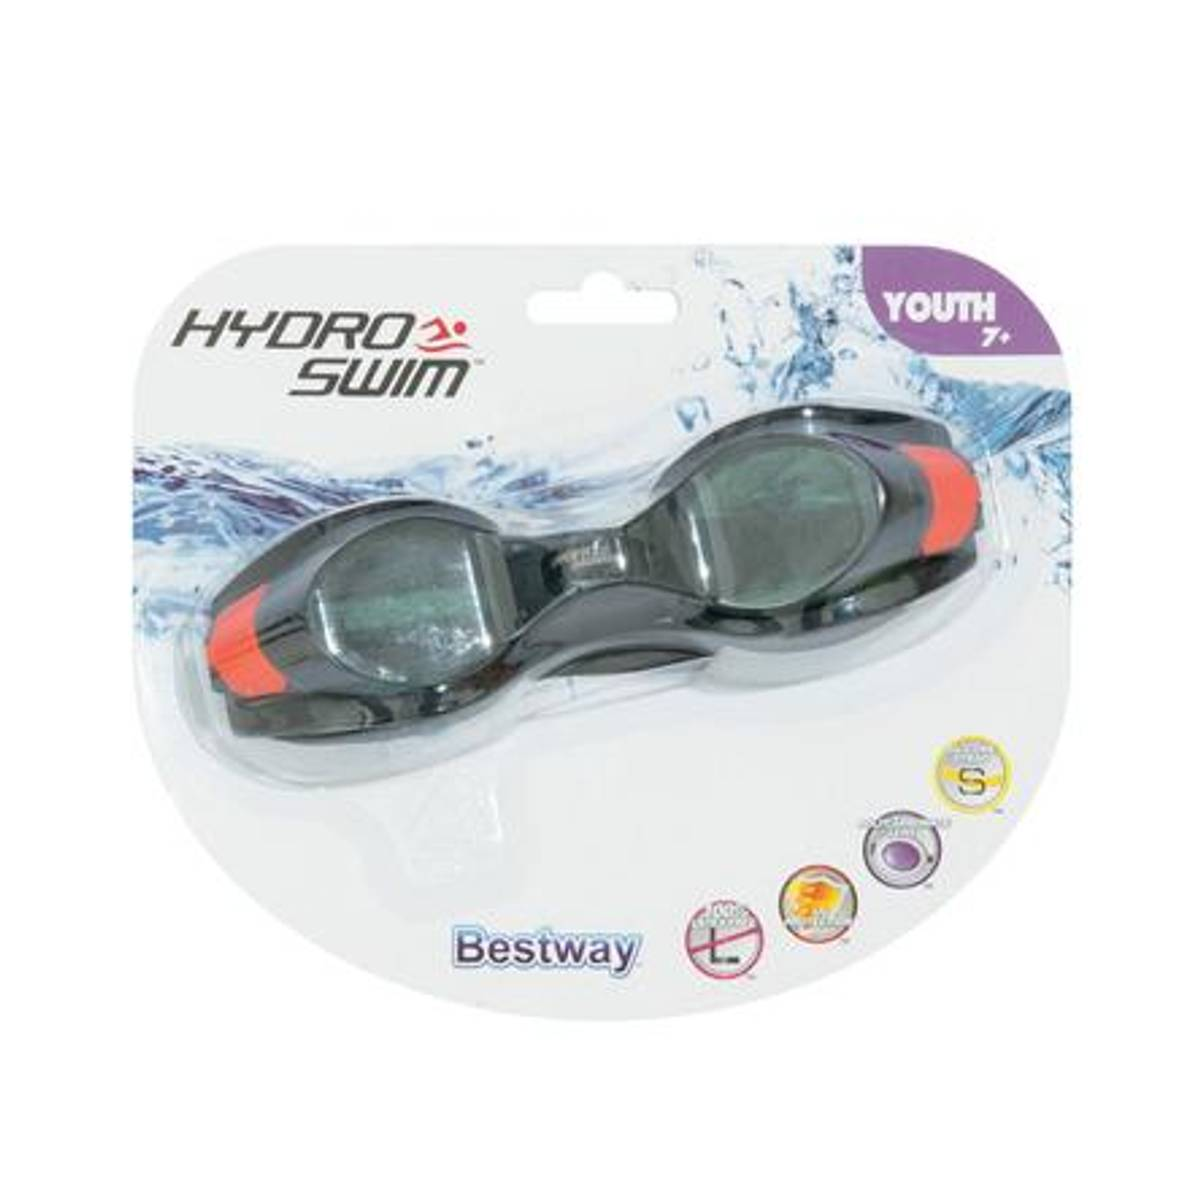 svart orange Hydro swim youth 7-14 år svømmebriller